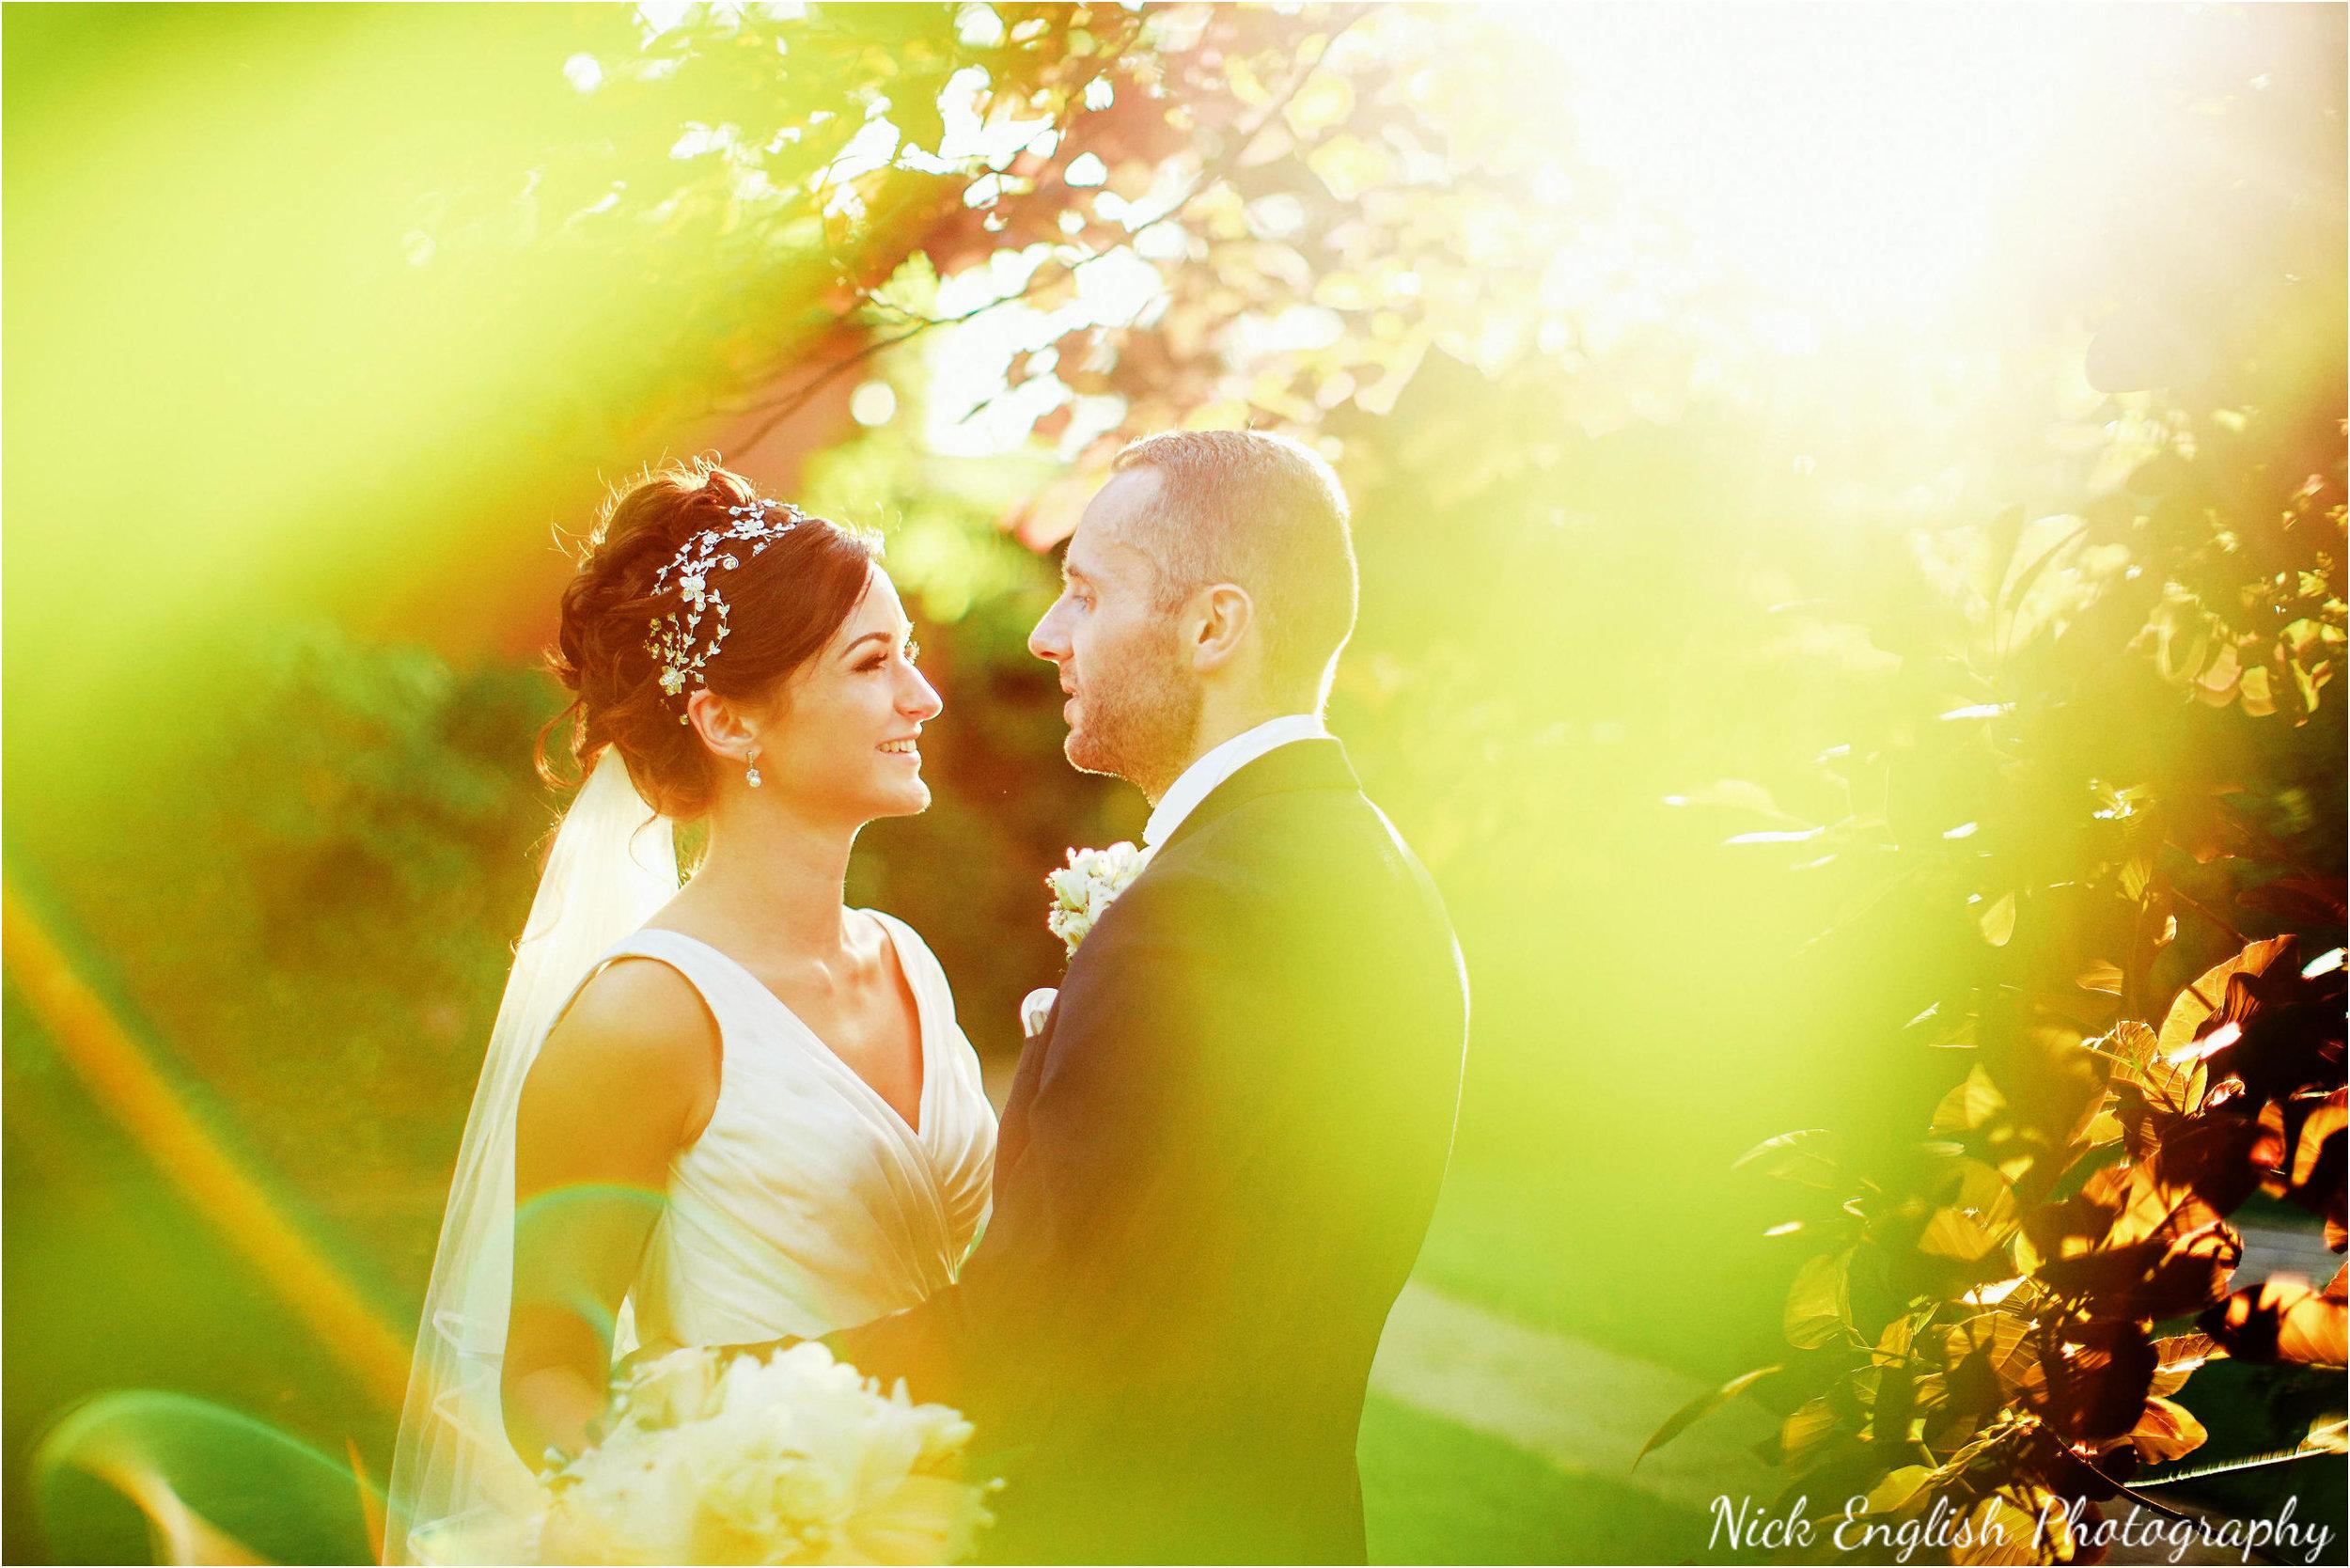 Emily David Wedding Photographs at Barton Grange Preston by Nick English Photography 199jpg.jpeg